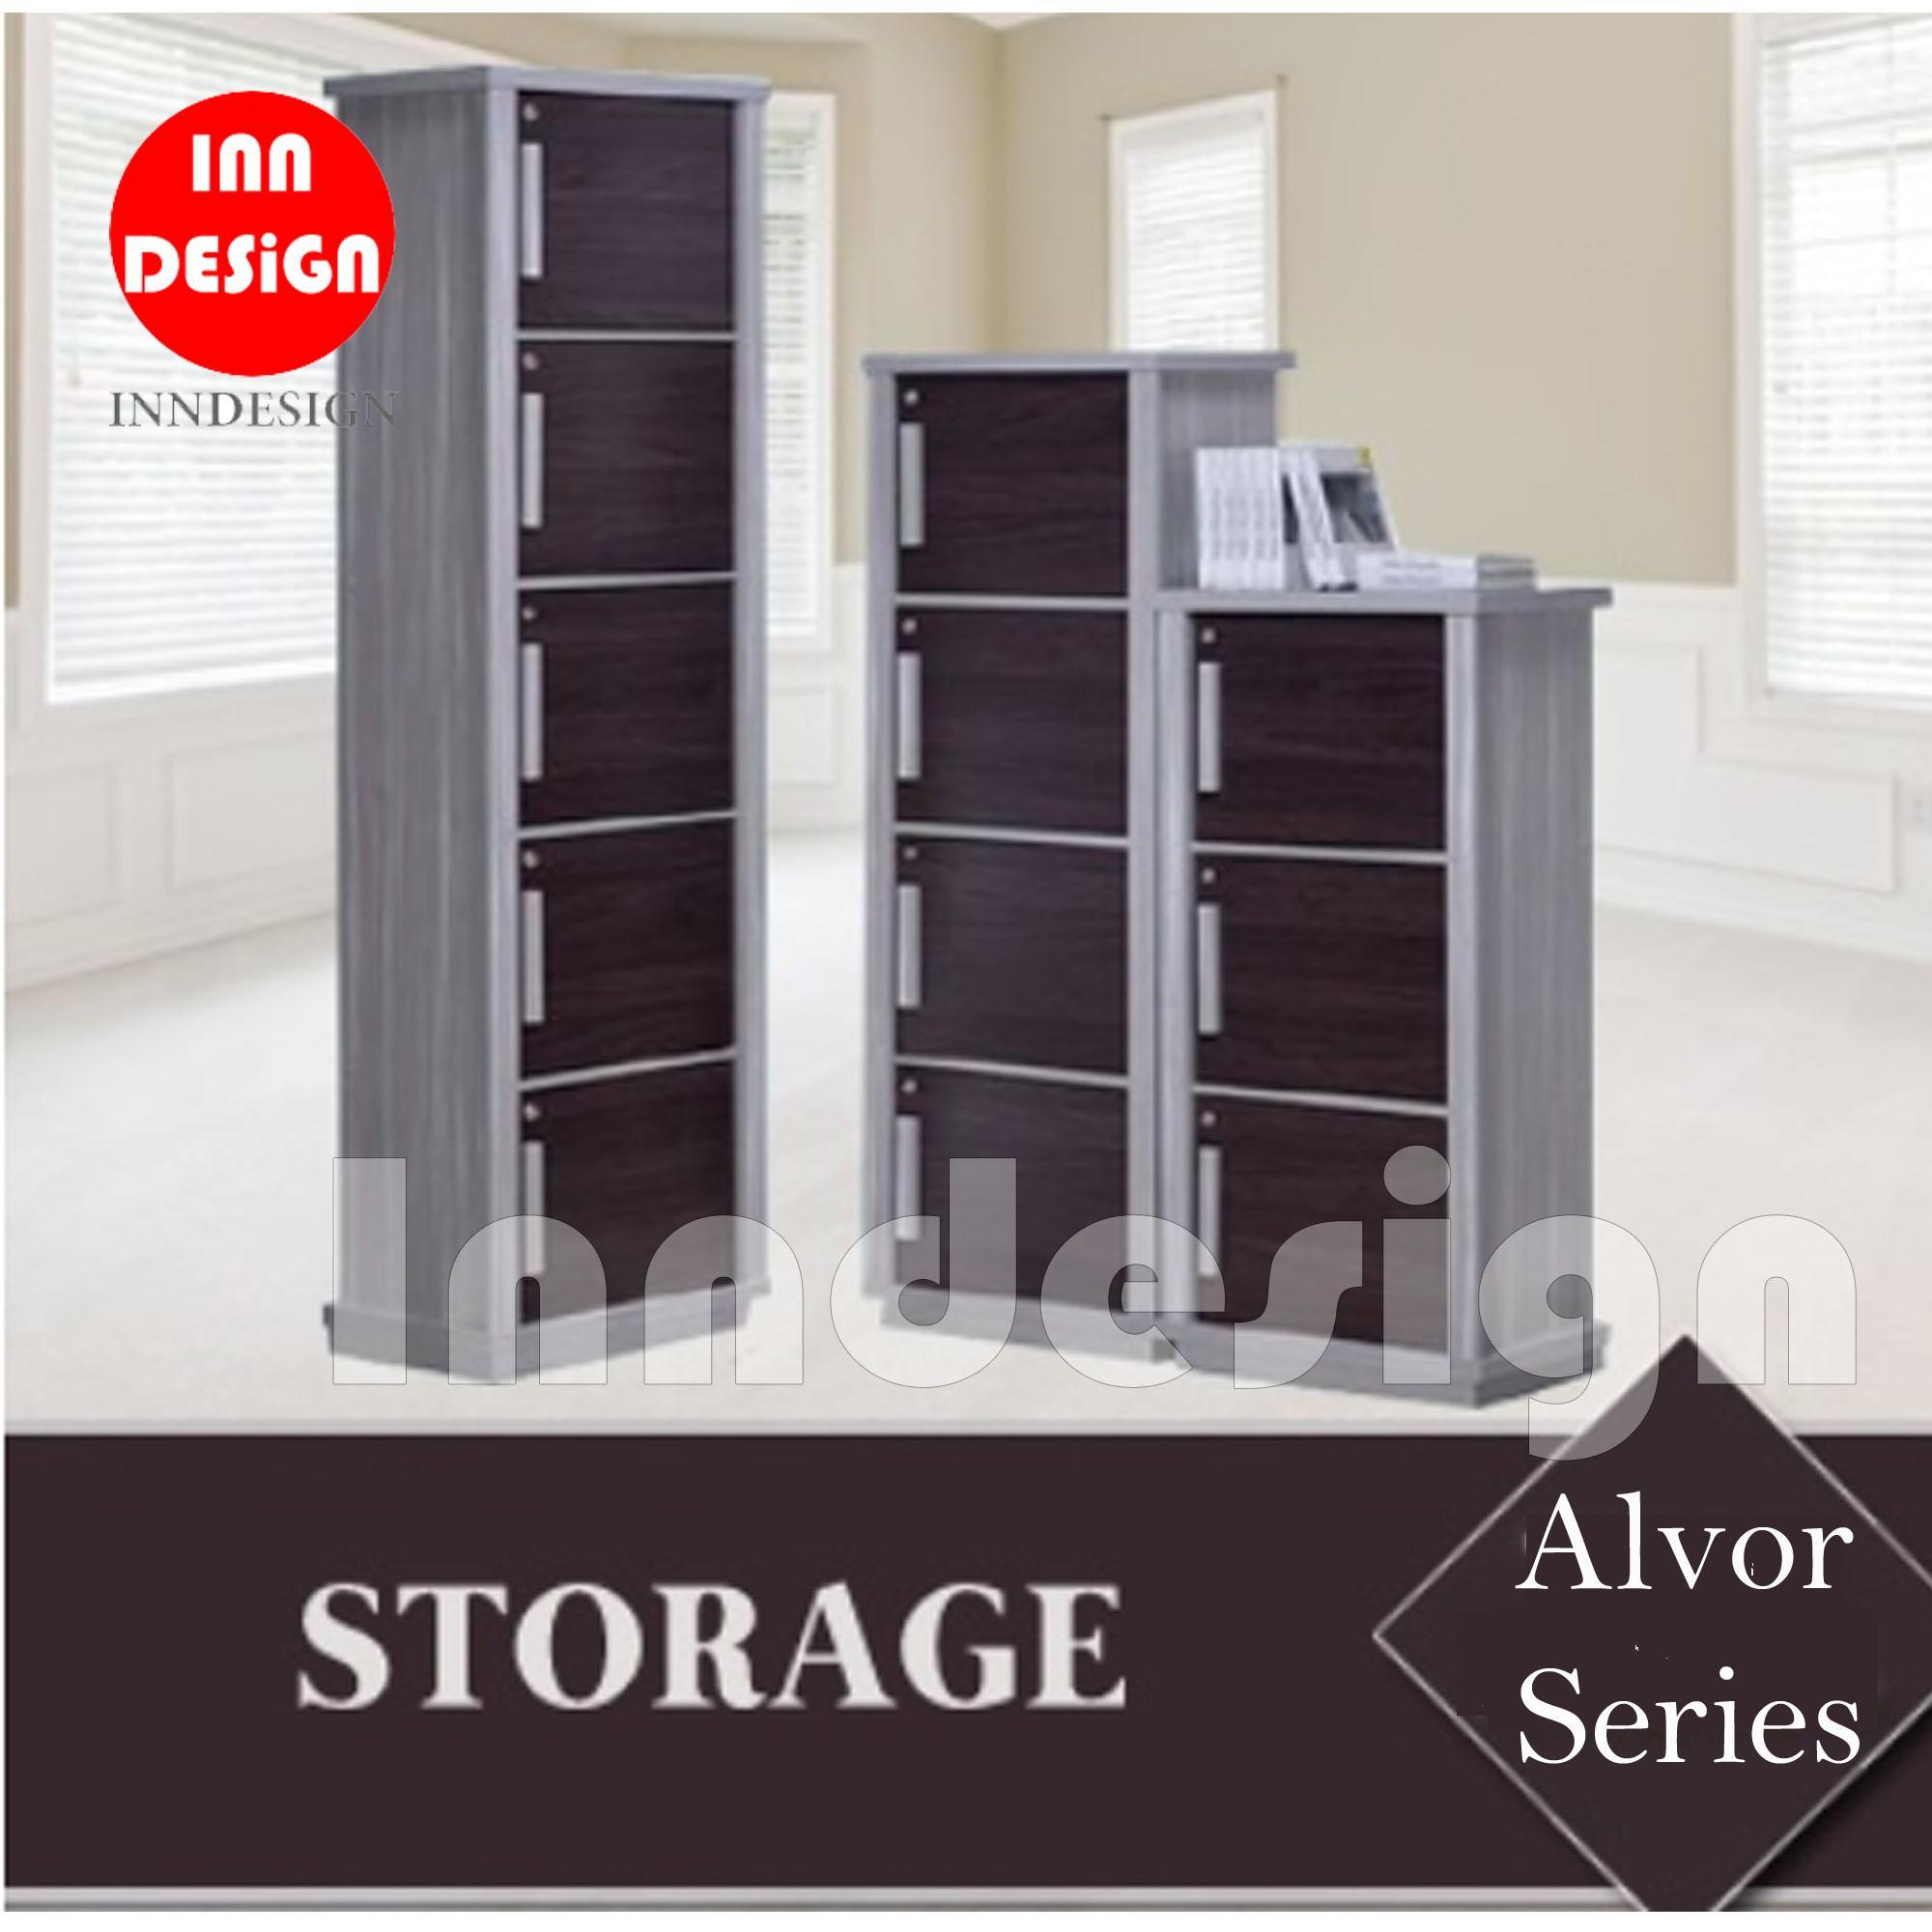 Alvor Series Utility Cabinet / Bookshelf / Storage Cabinet